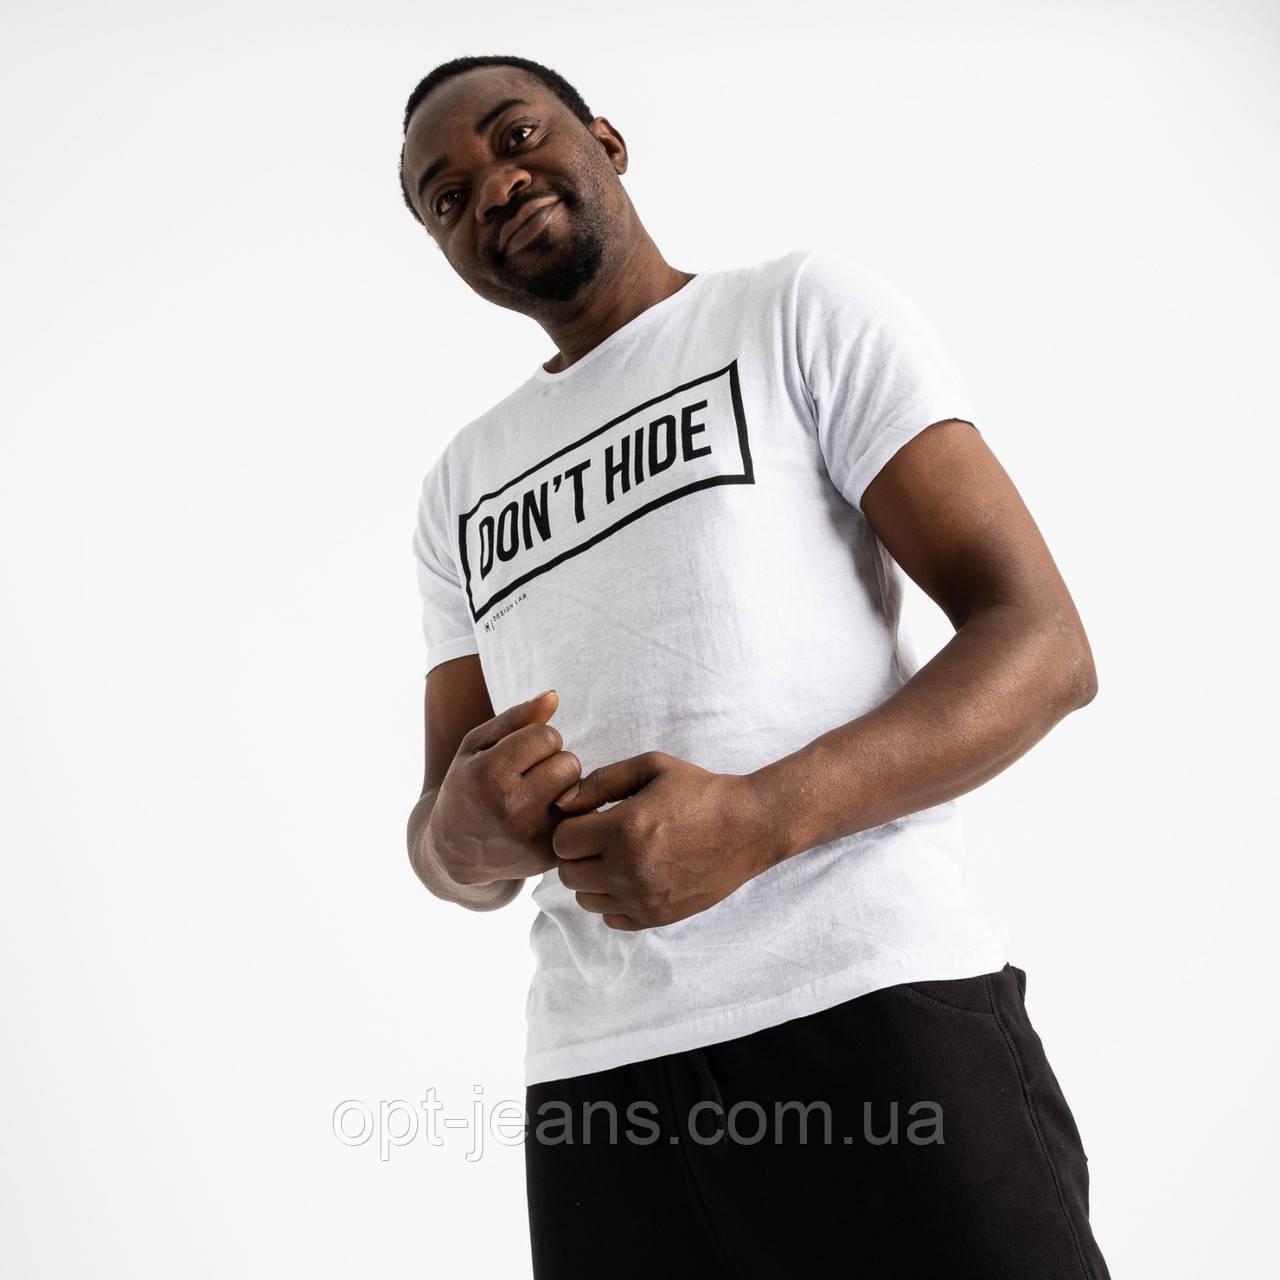 2702 футболка батальная мужская с принтом (4 ед. размеры: XL.2XL.3XL.4XL)